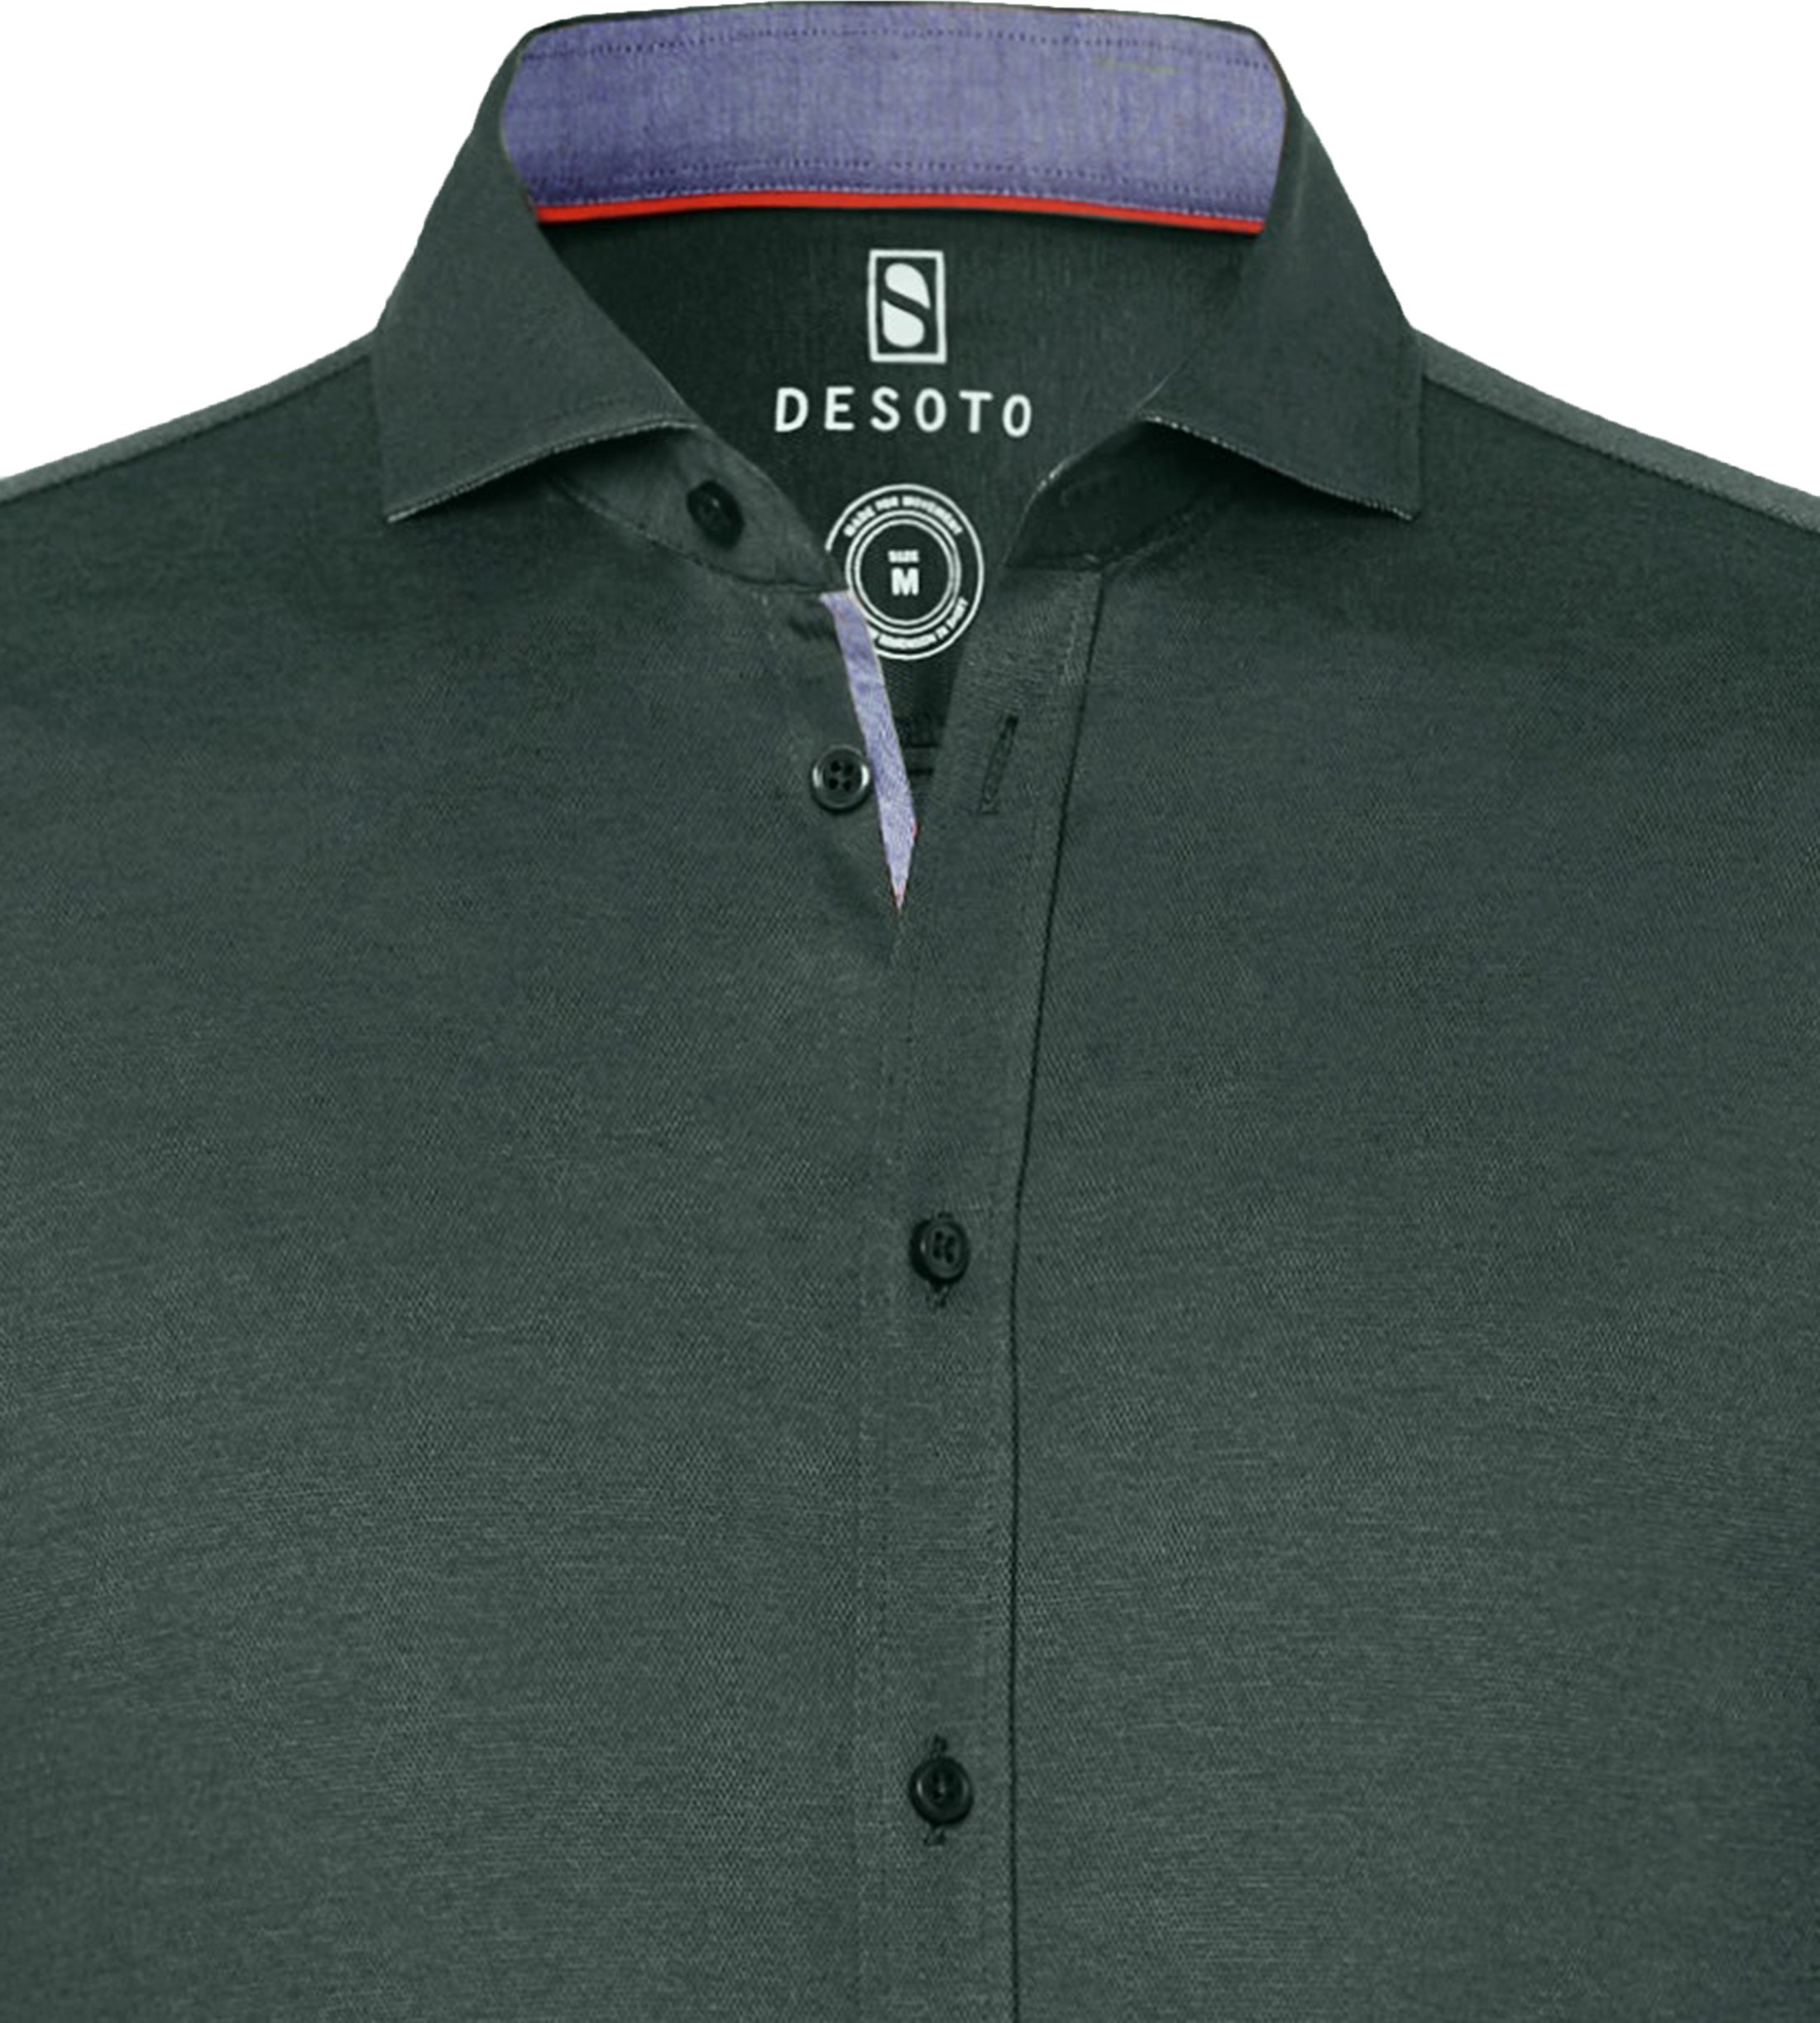 Desoto Overhemd Strijkvrij Donkergroen 602 foto 1